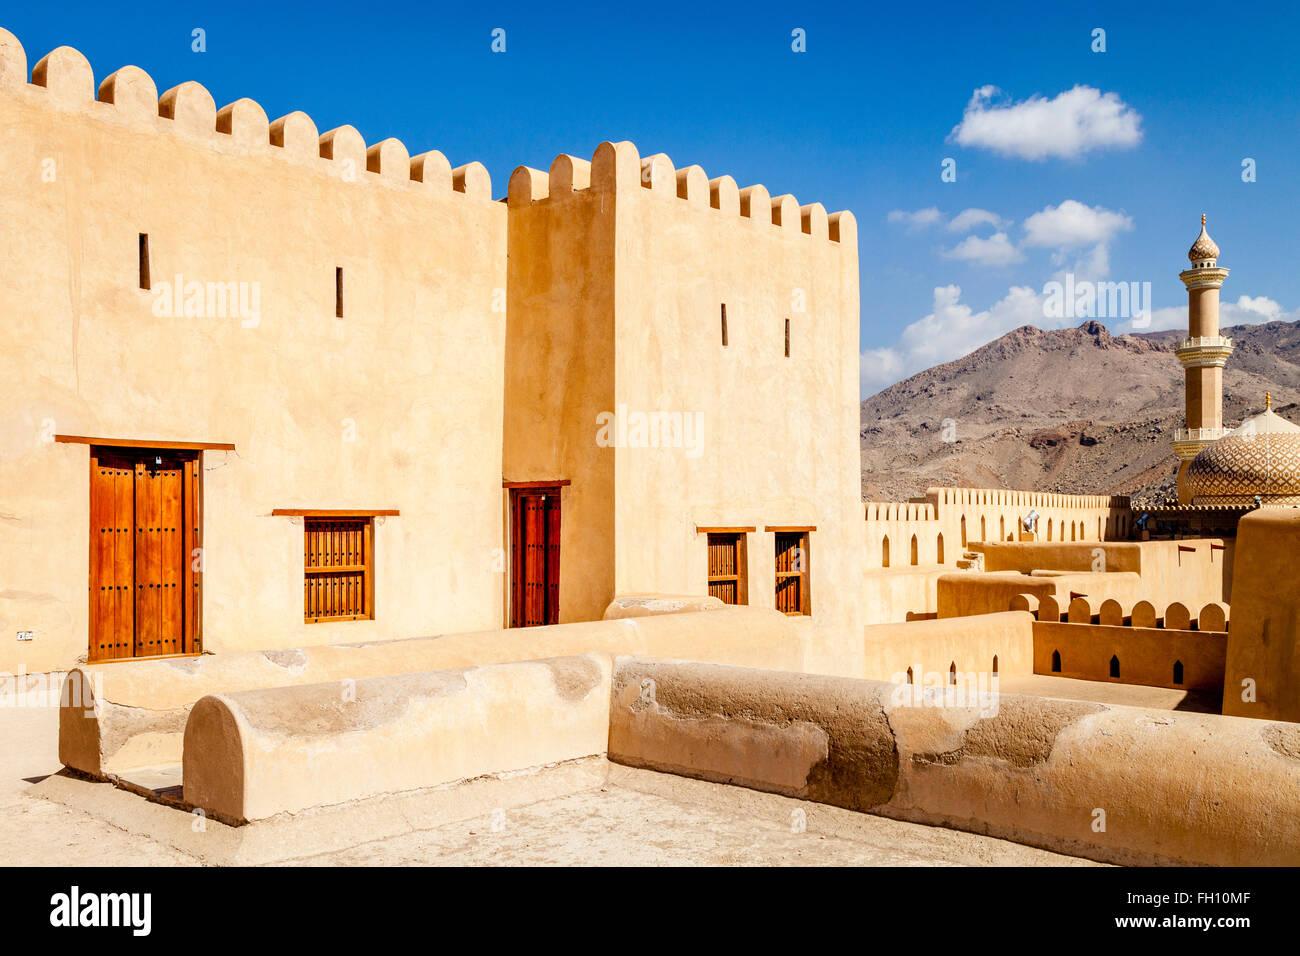 La fortaleza de Nizwa Nizwa, Ad Dakhiliyah, Región, Omán Imagen De Stock